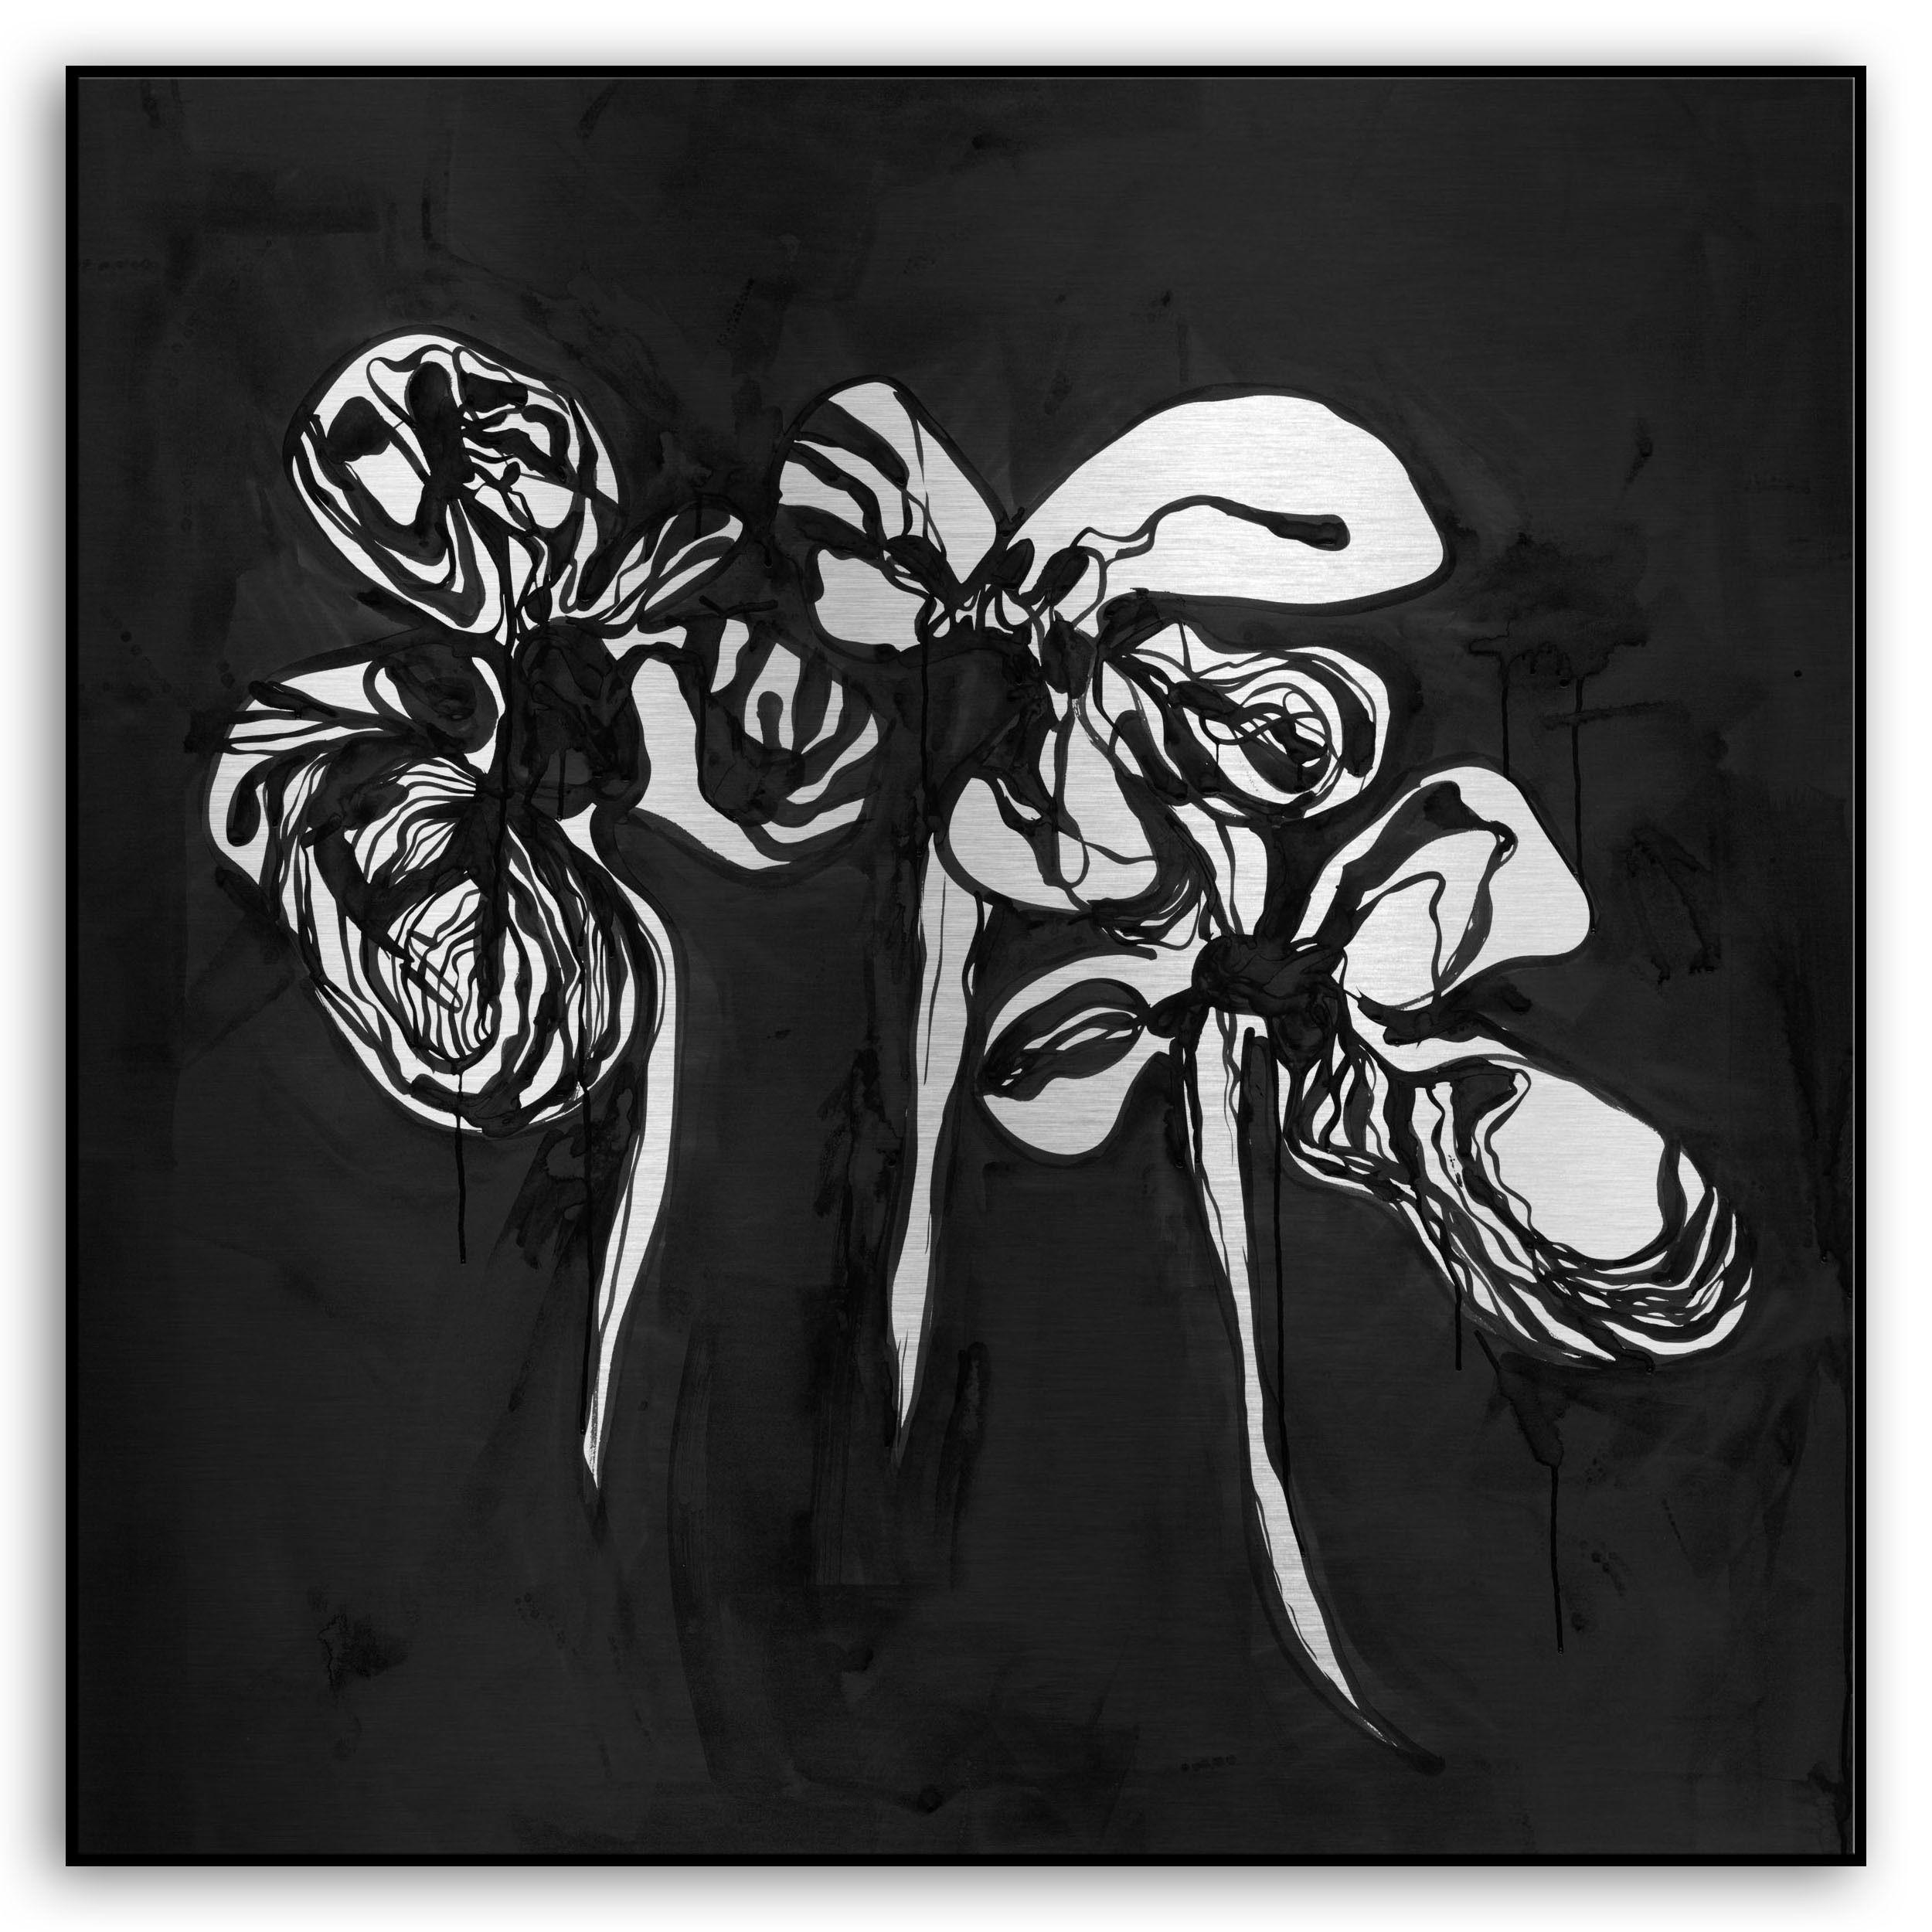 Gallery Direct Rupert Santos's 'Negative Space'